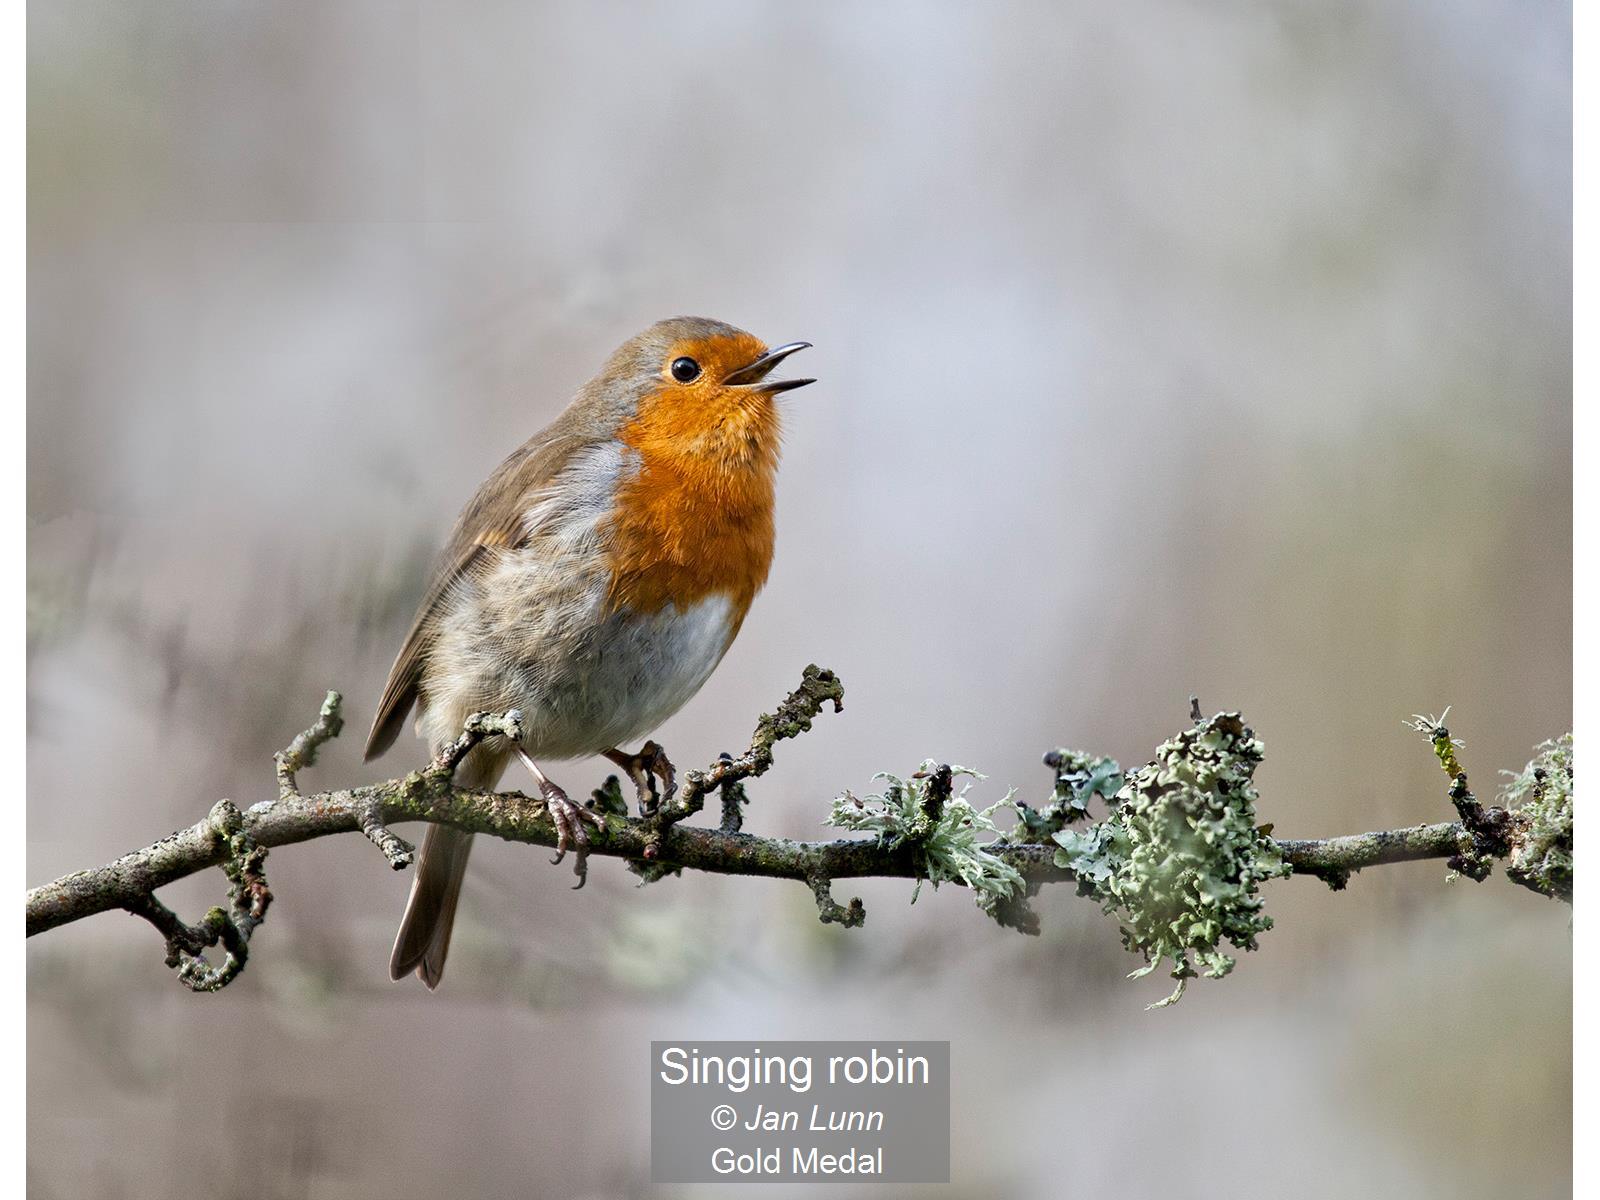 Singing robin_Jan Lunn_Gold